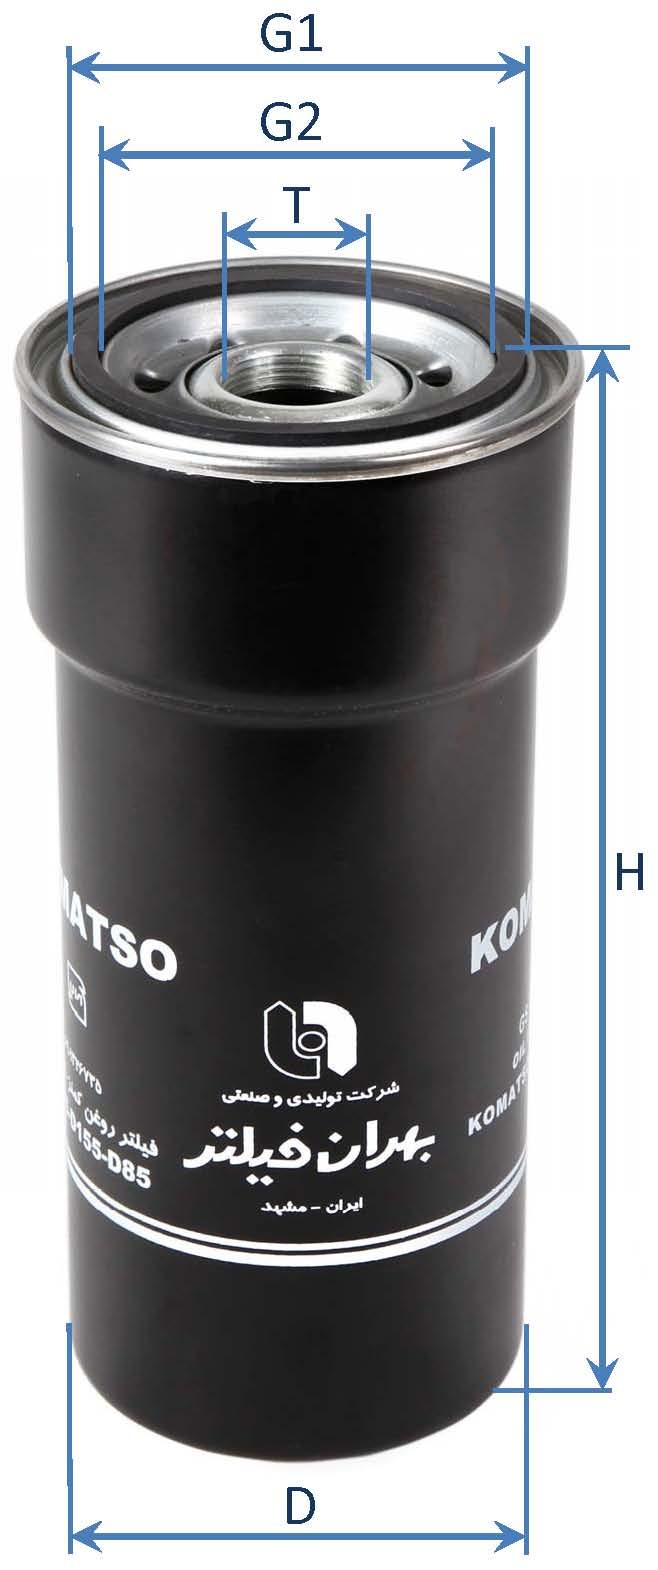 فیلتر روغن كماتسوD355-D155-D85  -كمنز